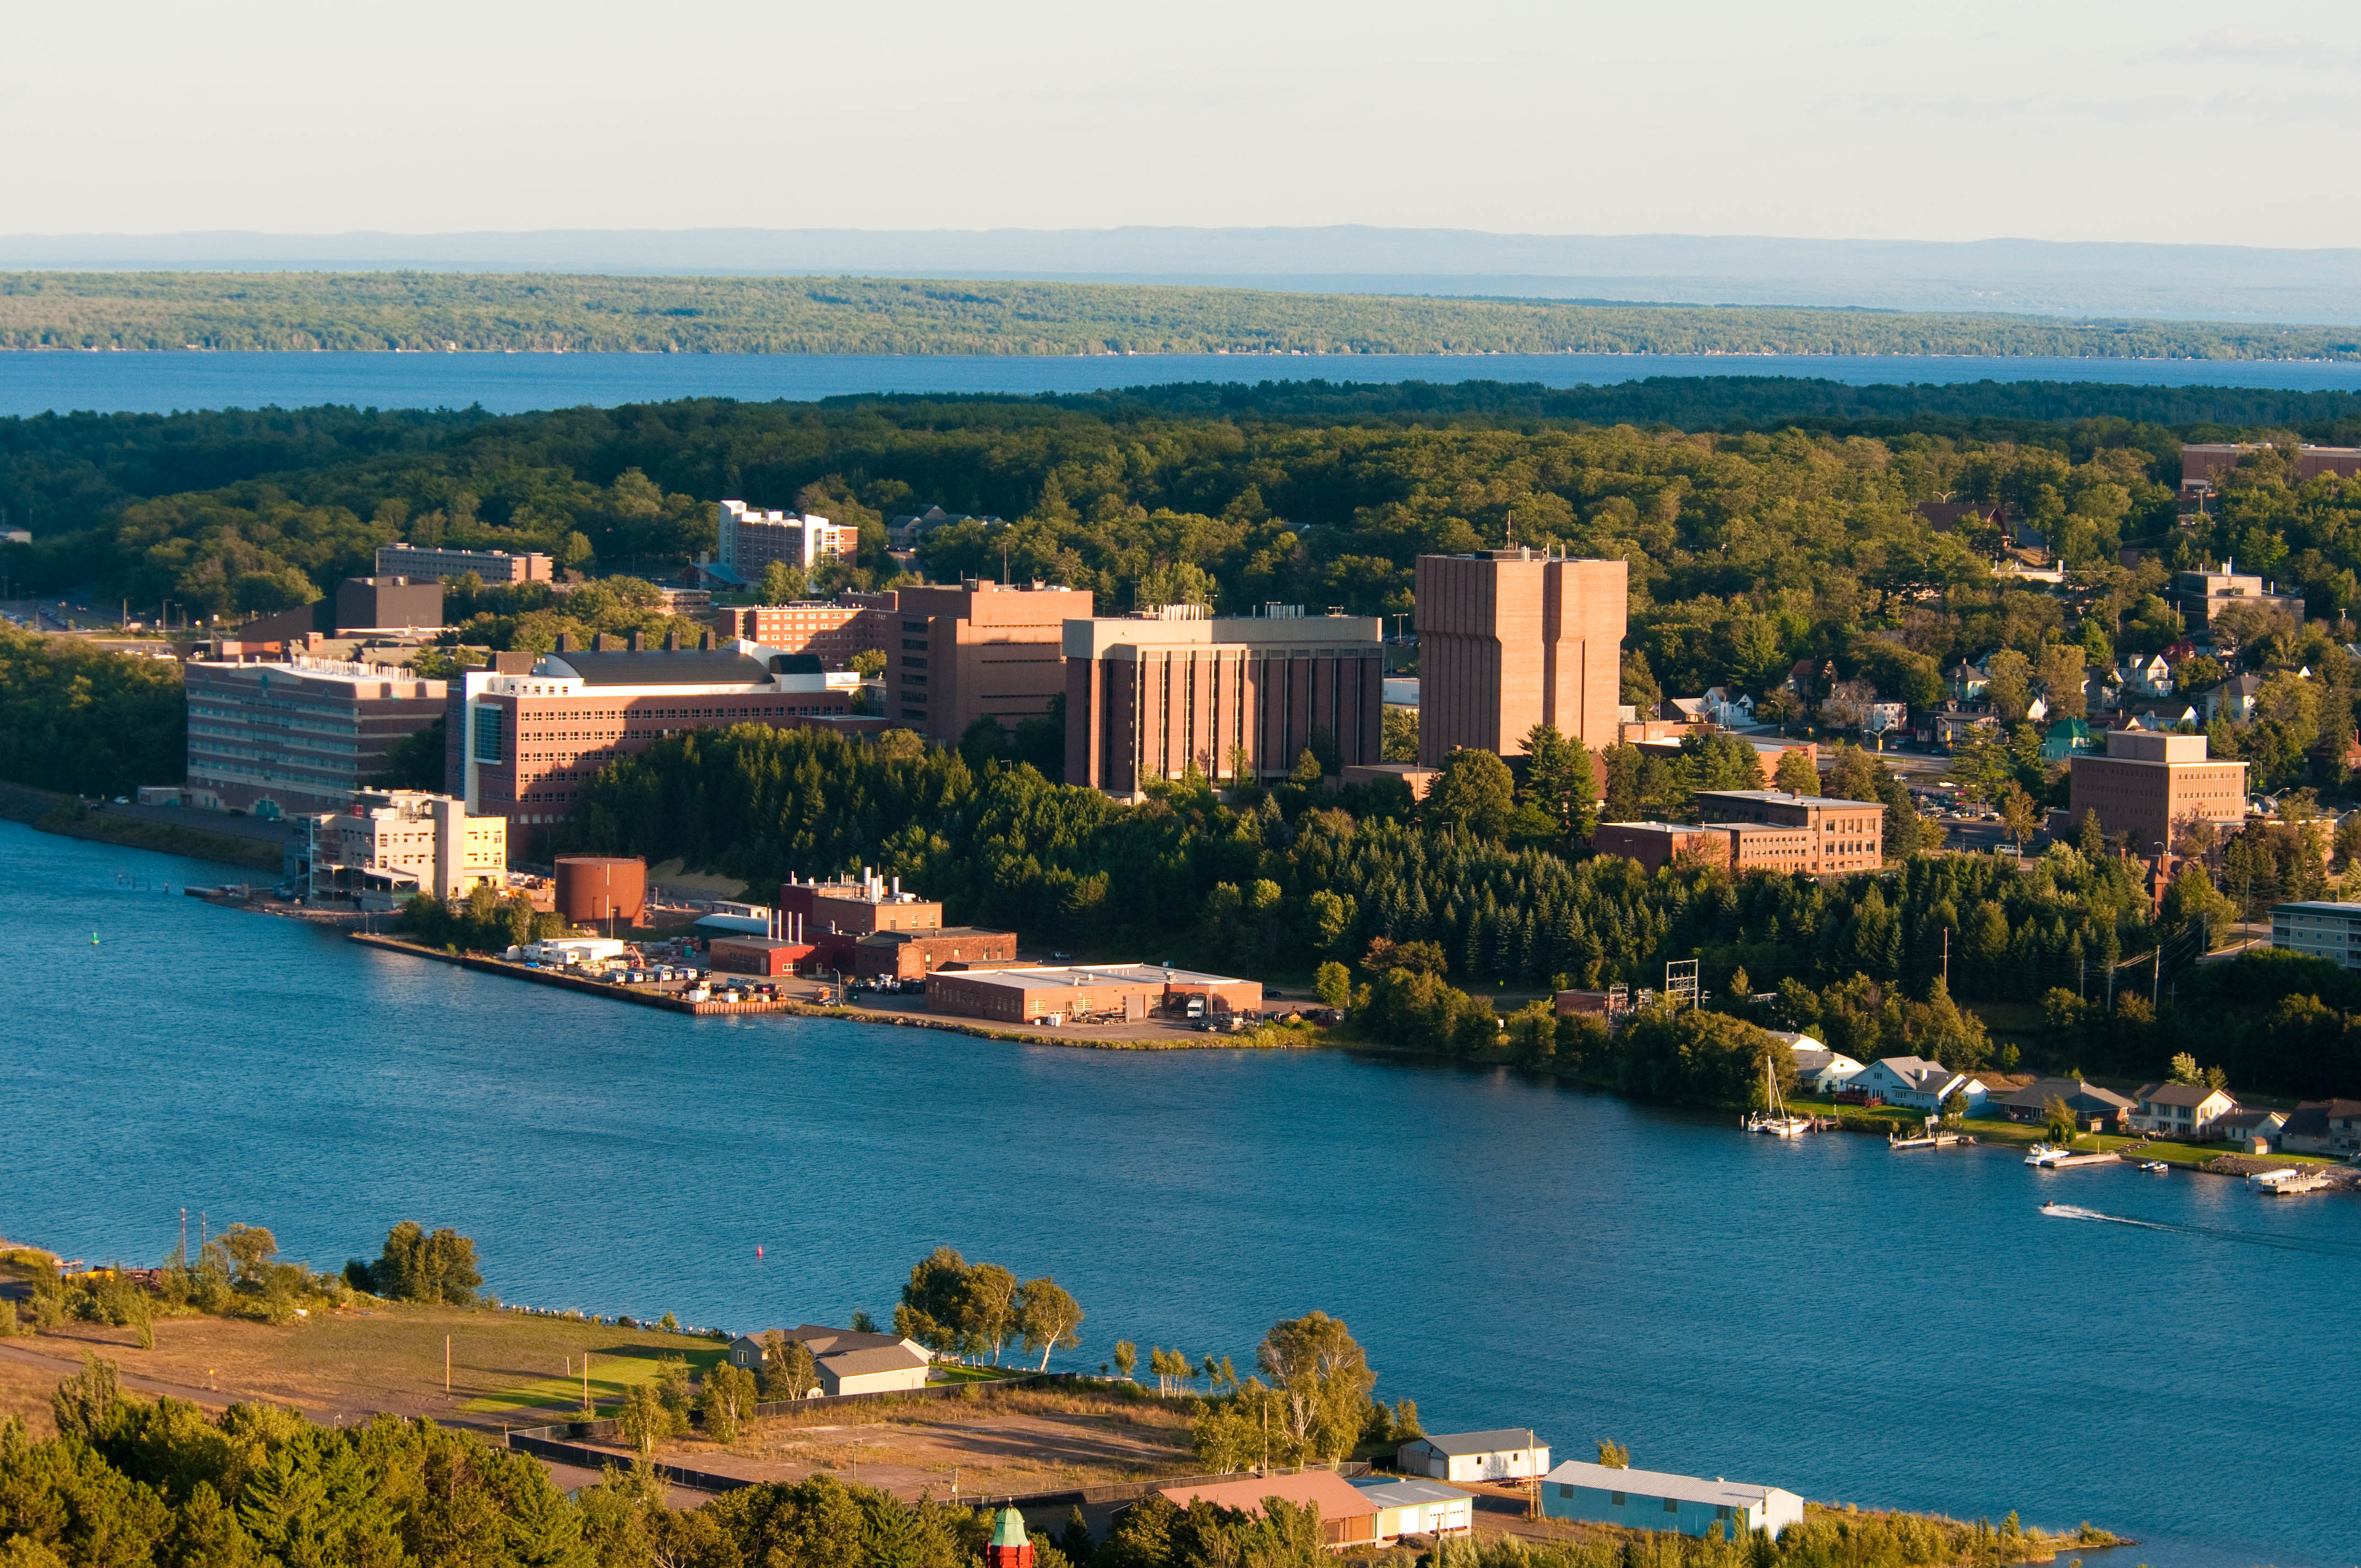 File:Michigan Tech campus 2011.jpg - Wikimedia Commons